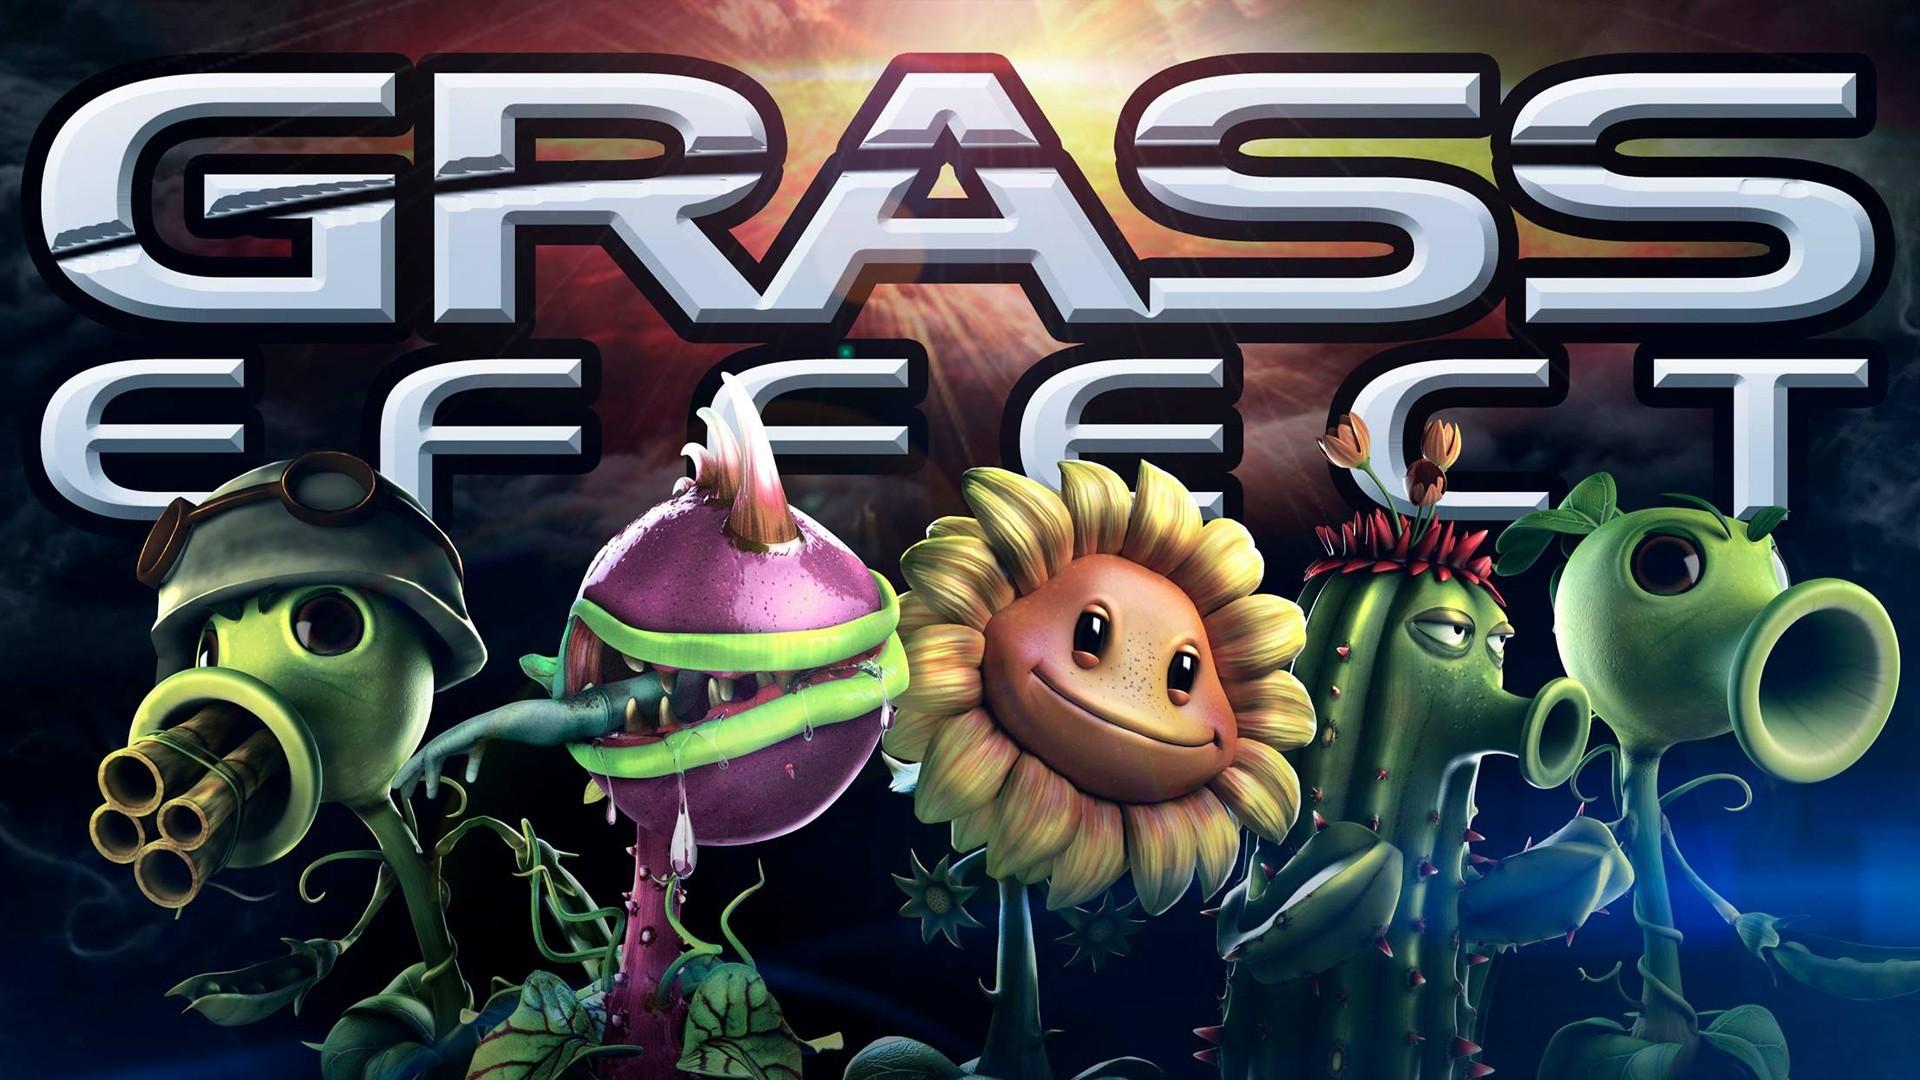 Free Download Plants Vs Zombies 2 Desktop And Mobile Wallpaper